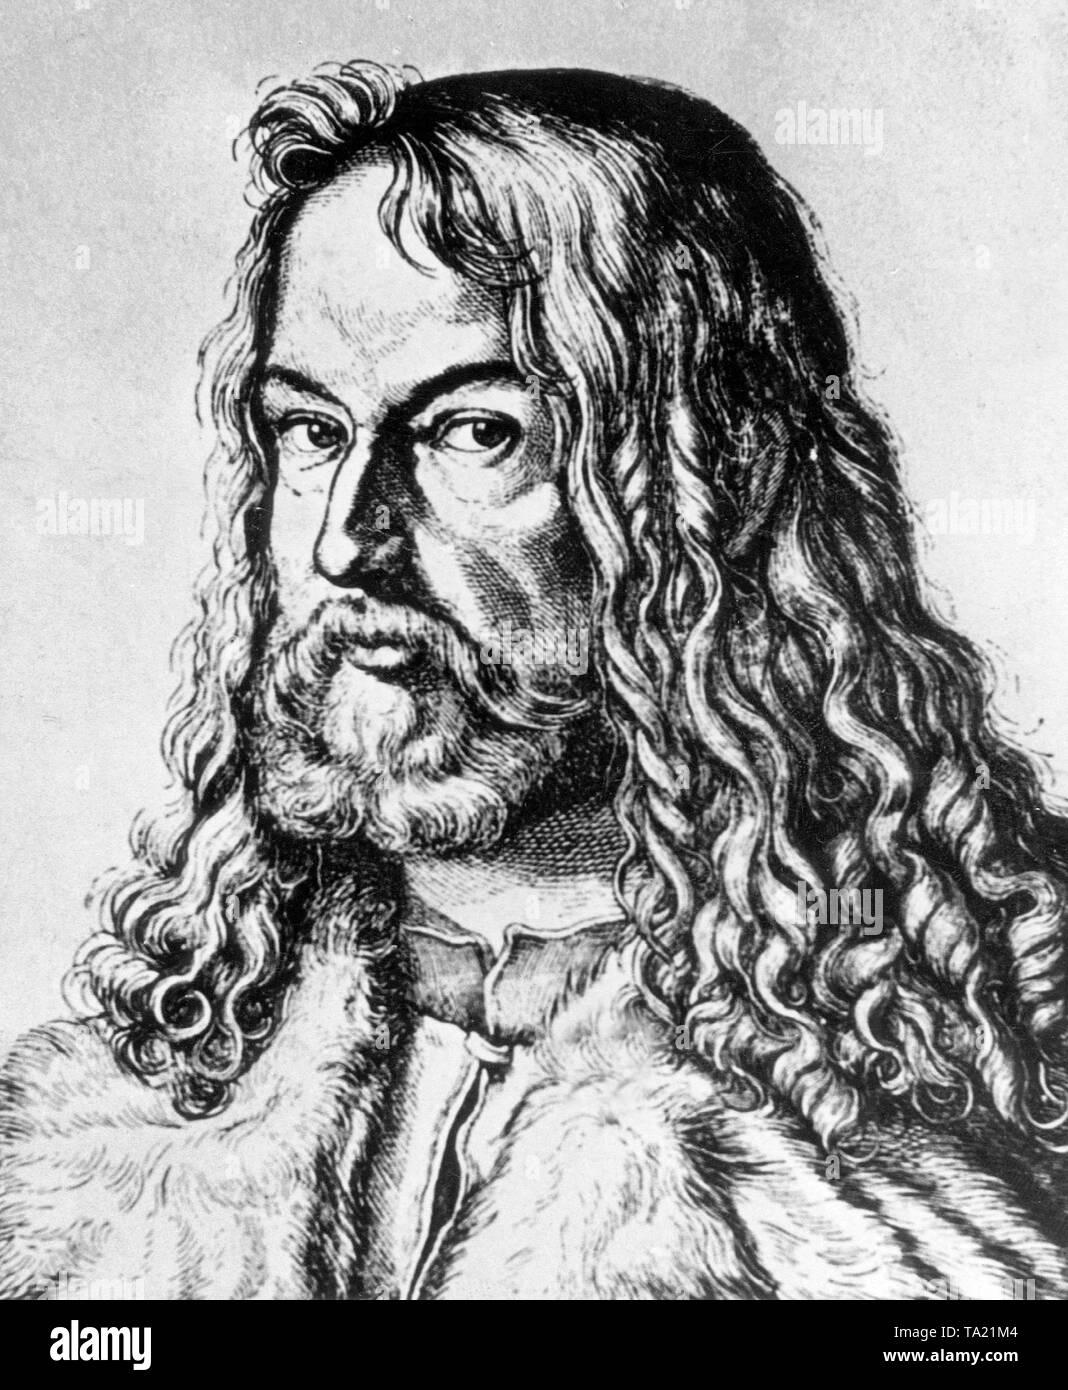 Self-portrait of the German painter and printmaker Albrecht Duerer (1471-1528). - Stock Image